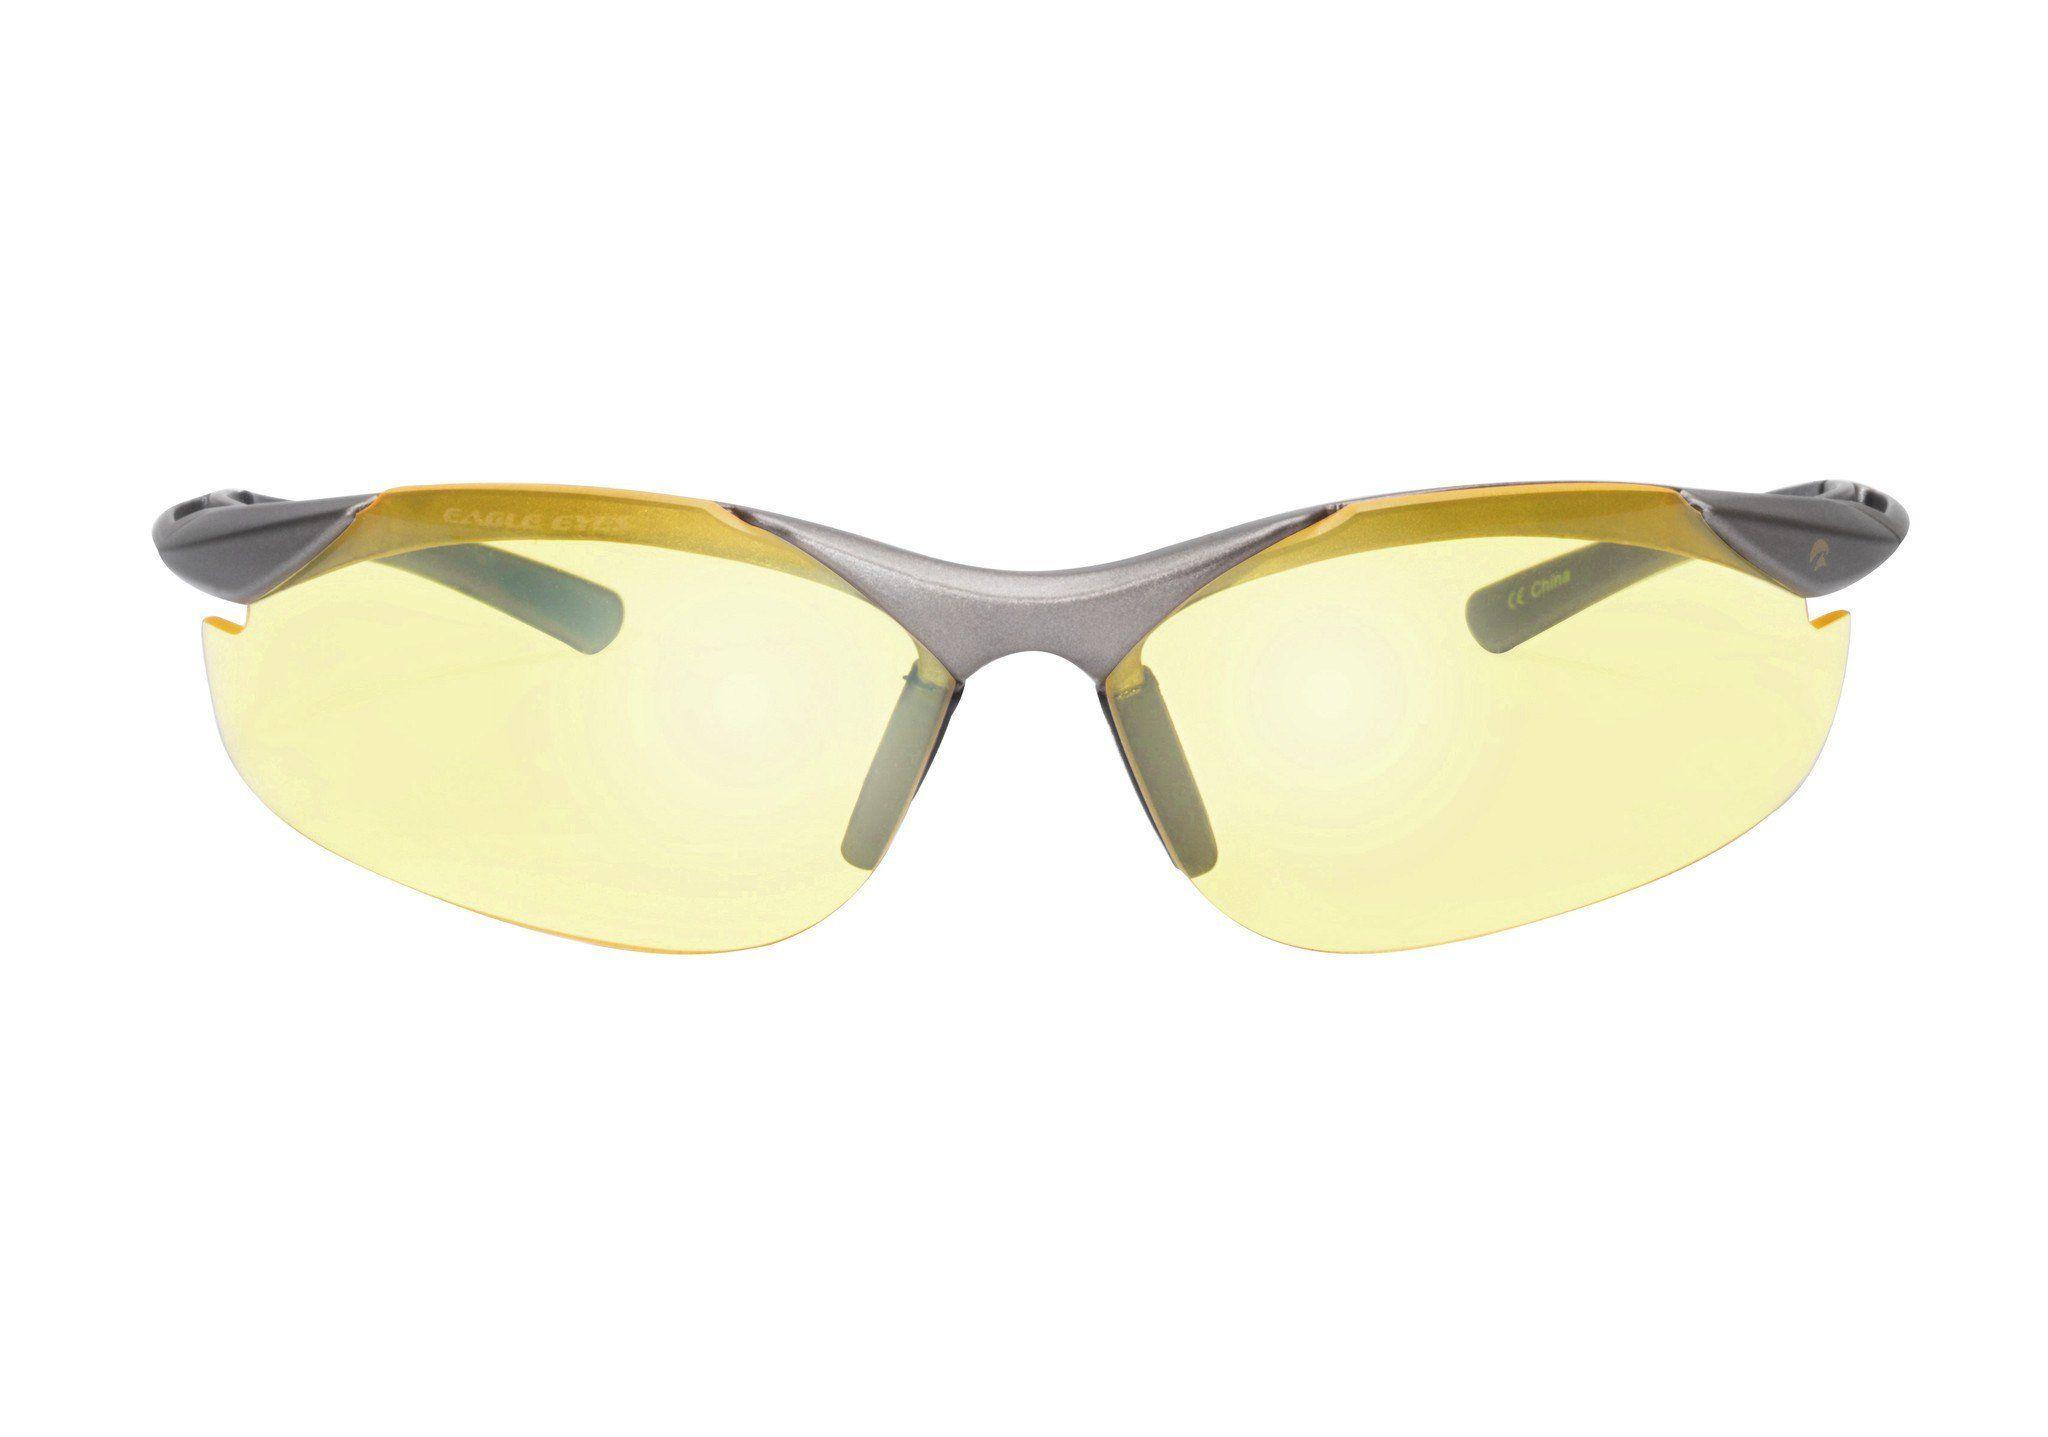 031edba9a49 Blade NL - Night Vision Glasses – Eagle Eyes Optics